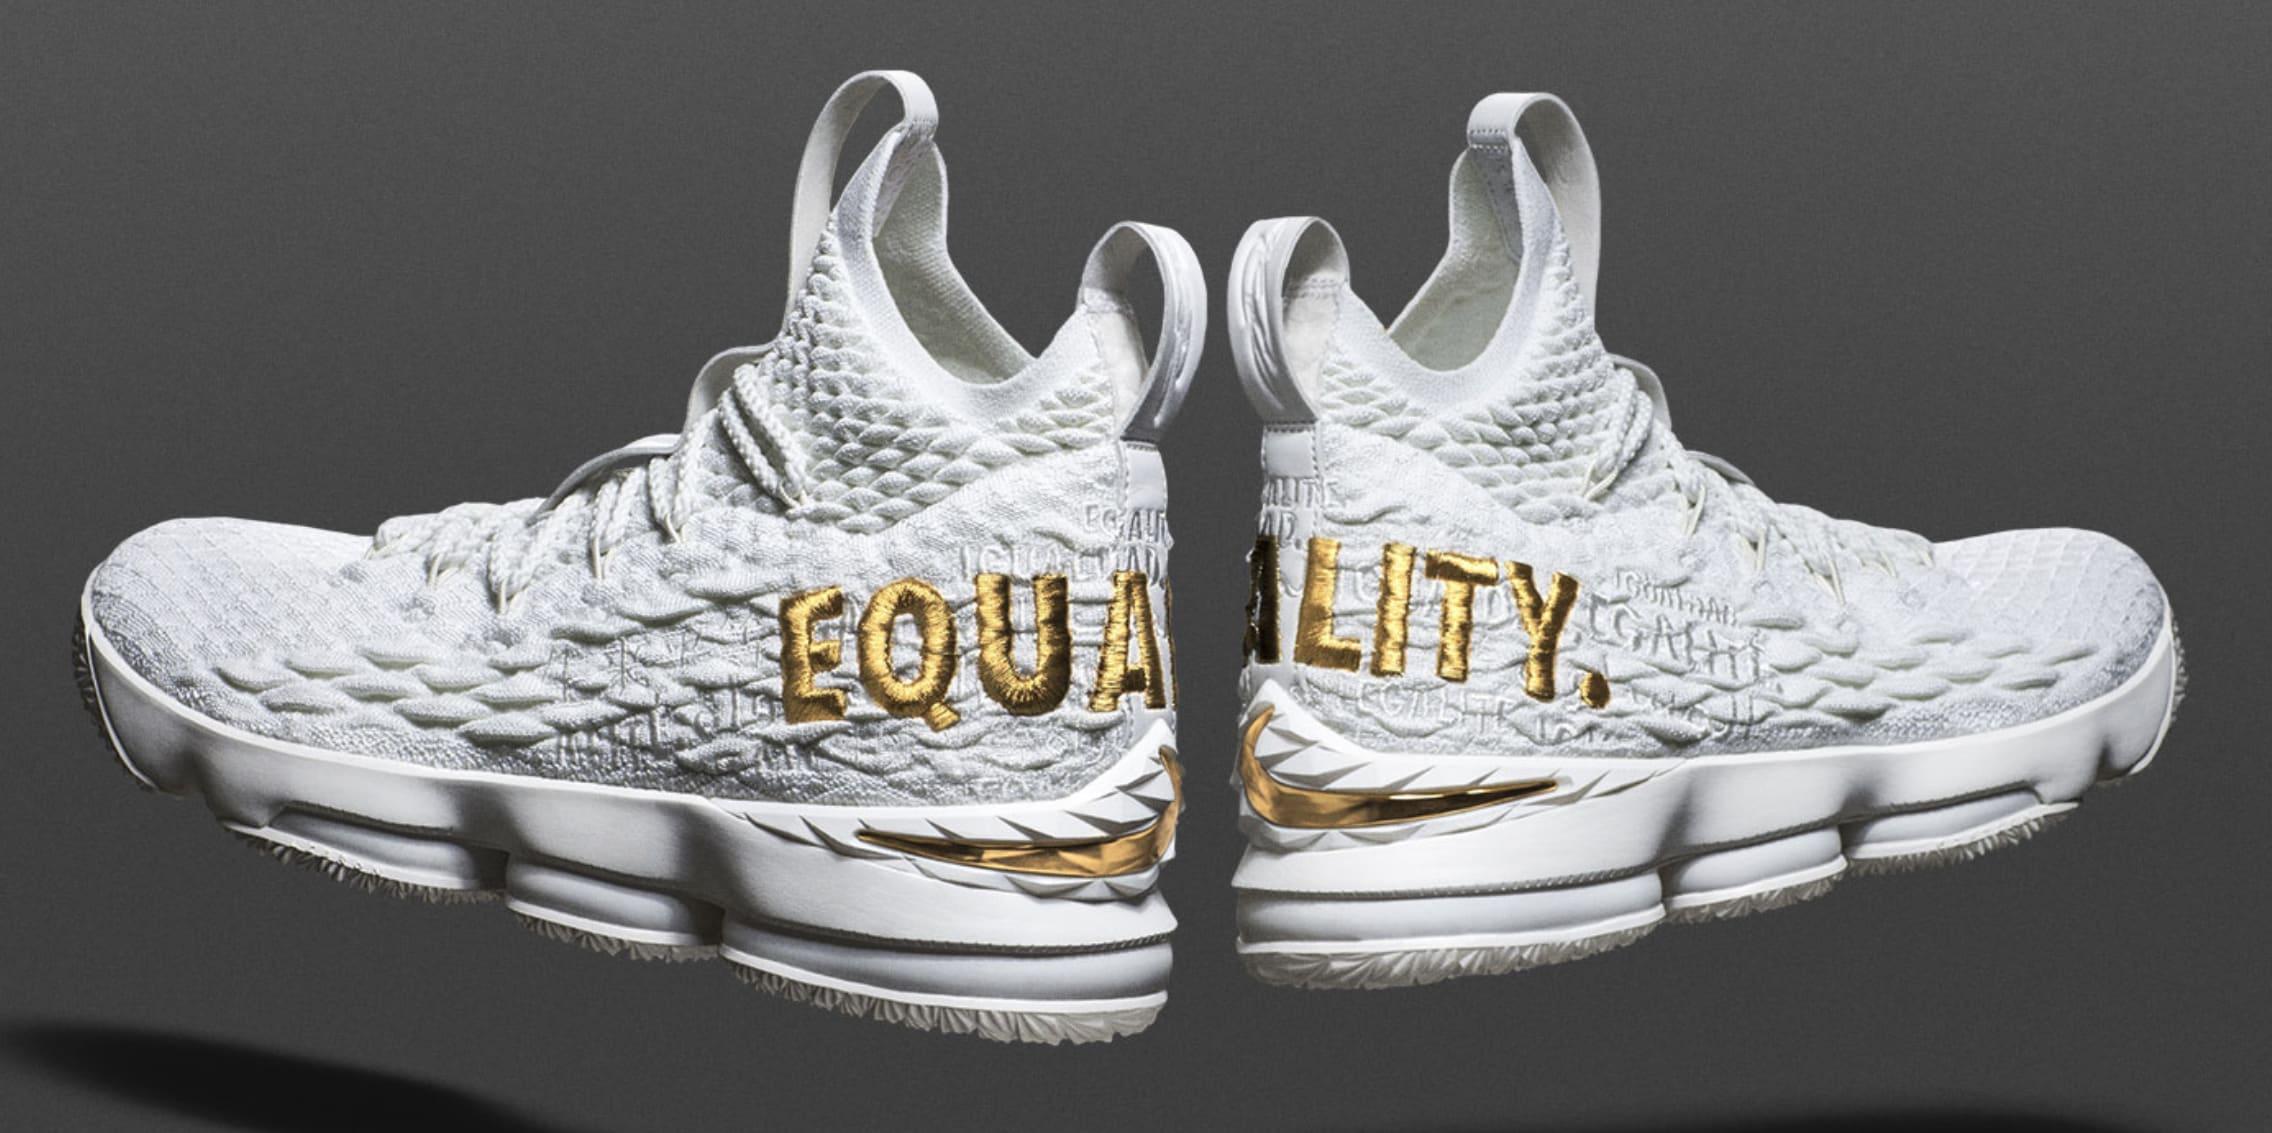 Nike LeBron 15 'Equality PE/White'